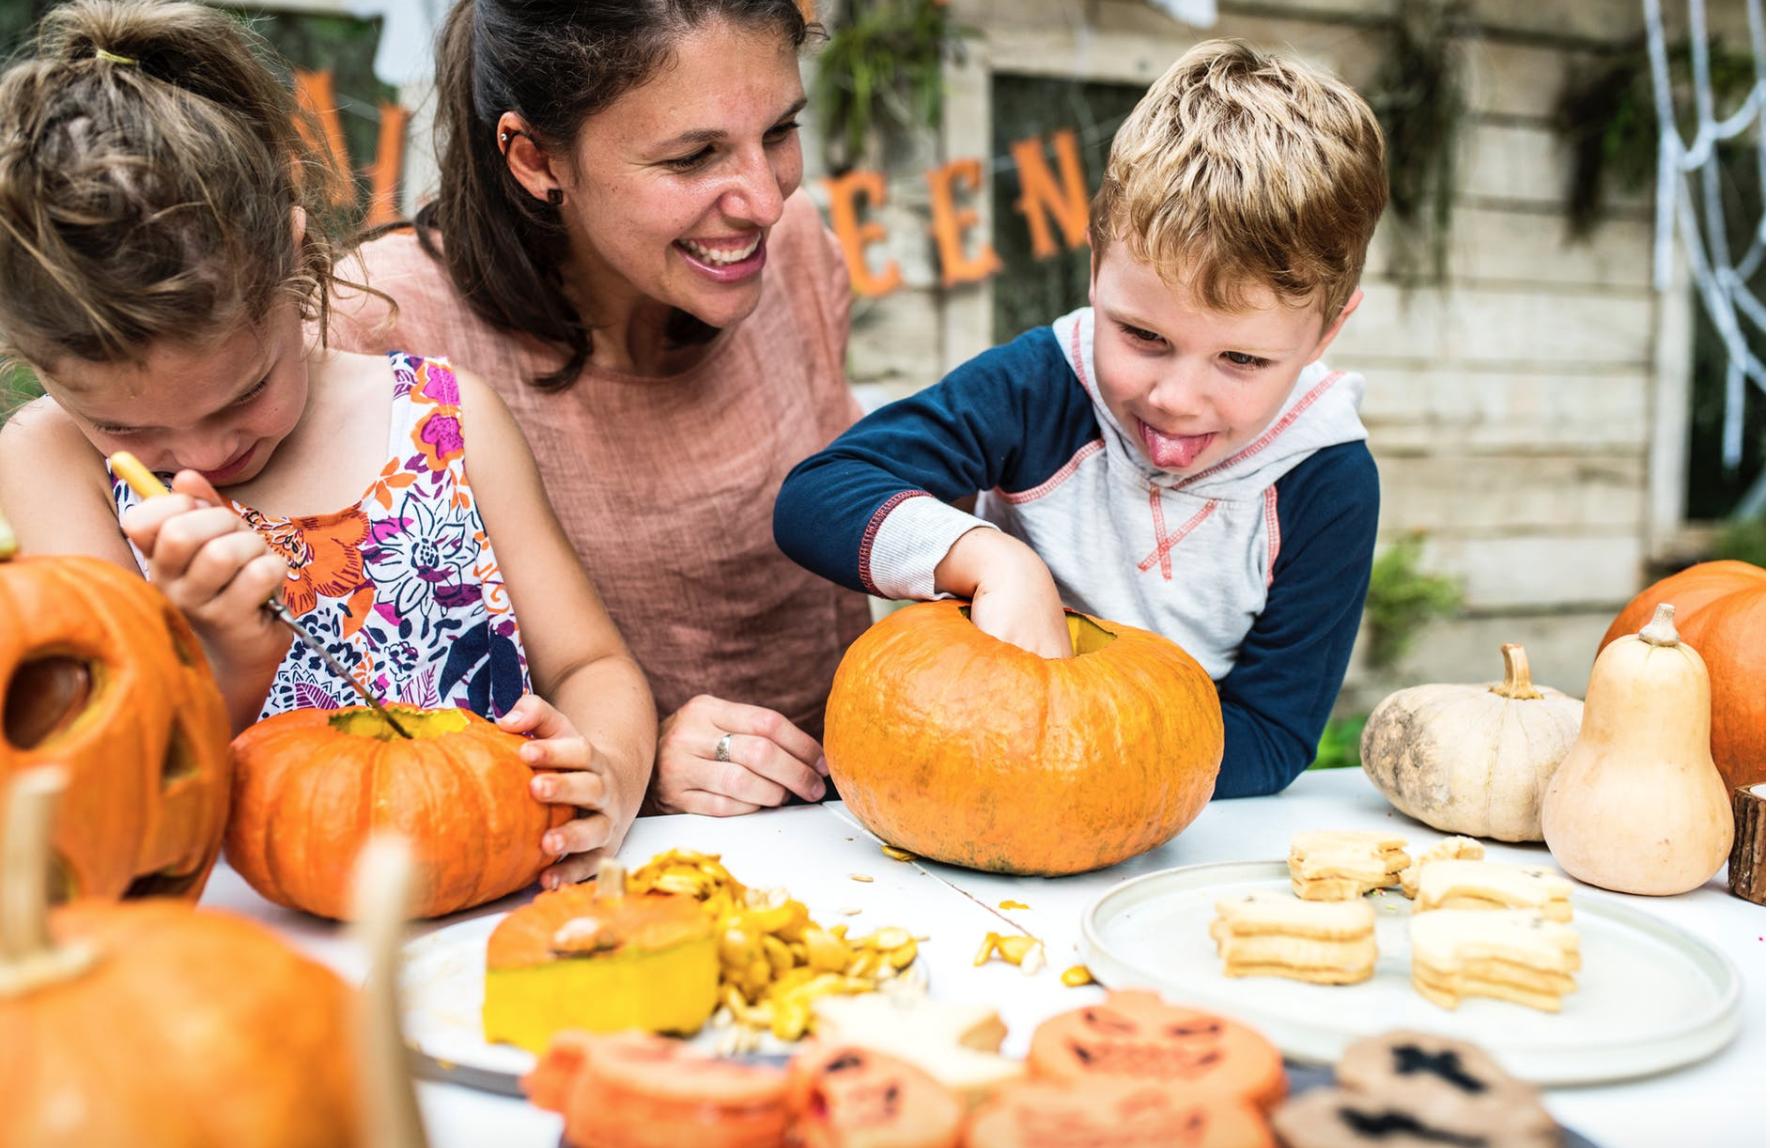 children-carving-pumpkins